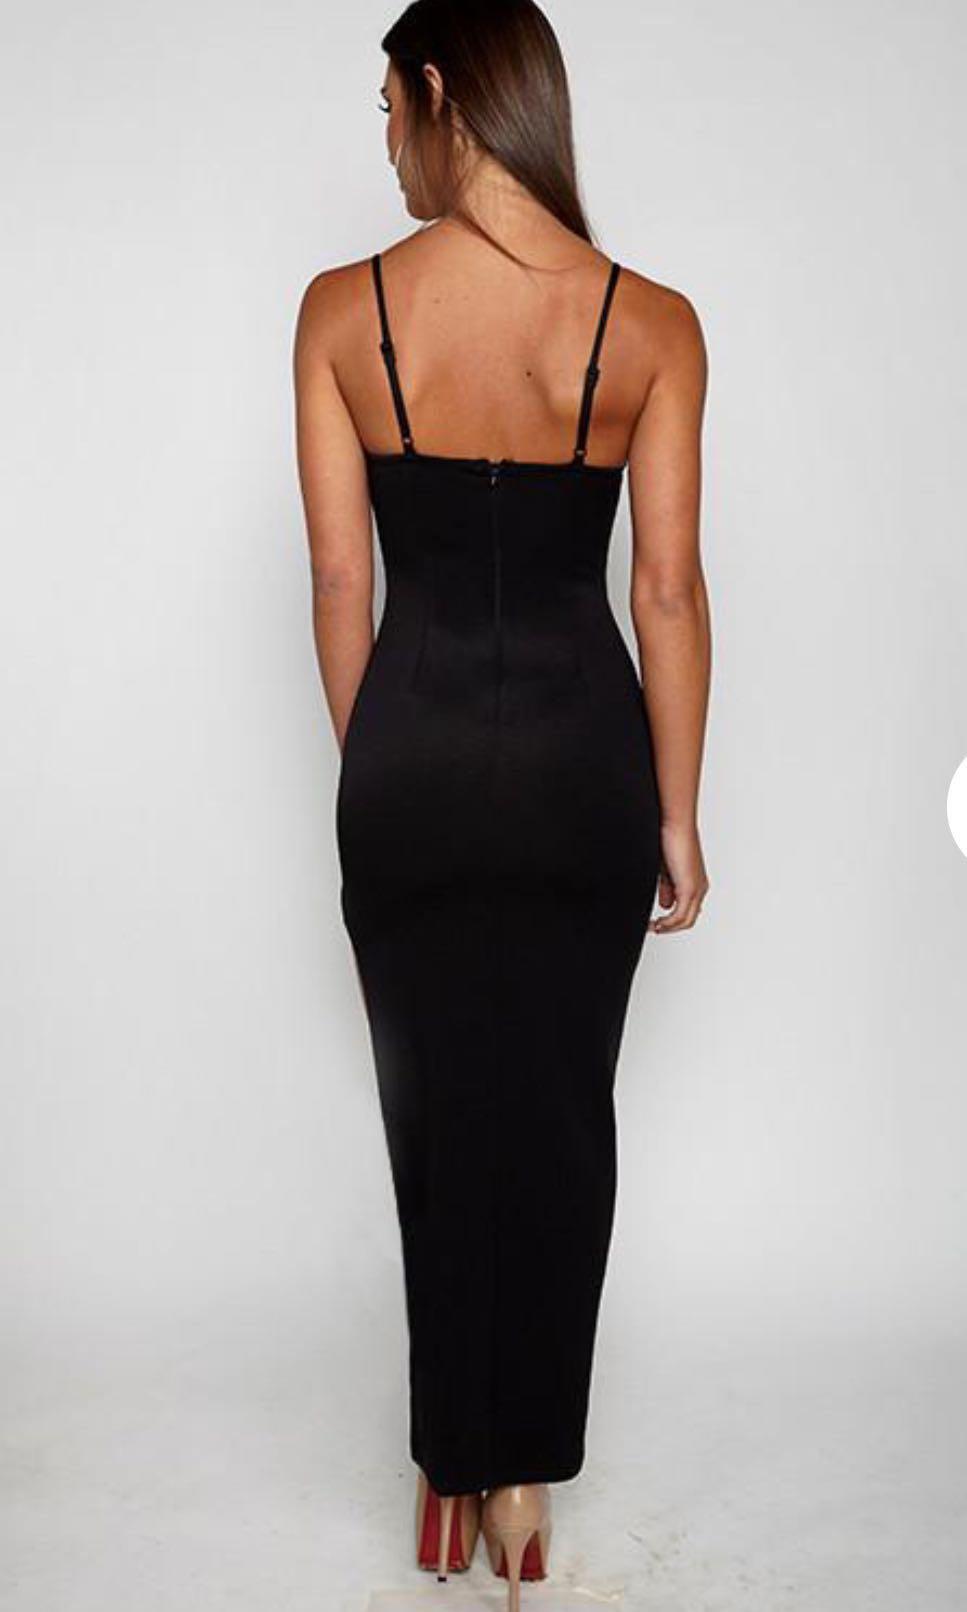 Black MAXI ball dress! Size 10